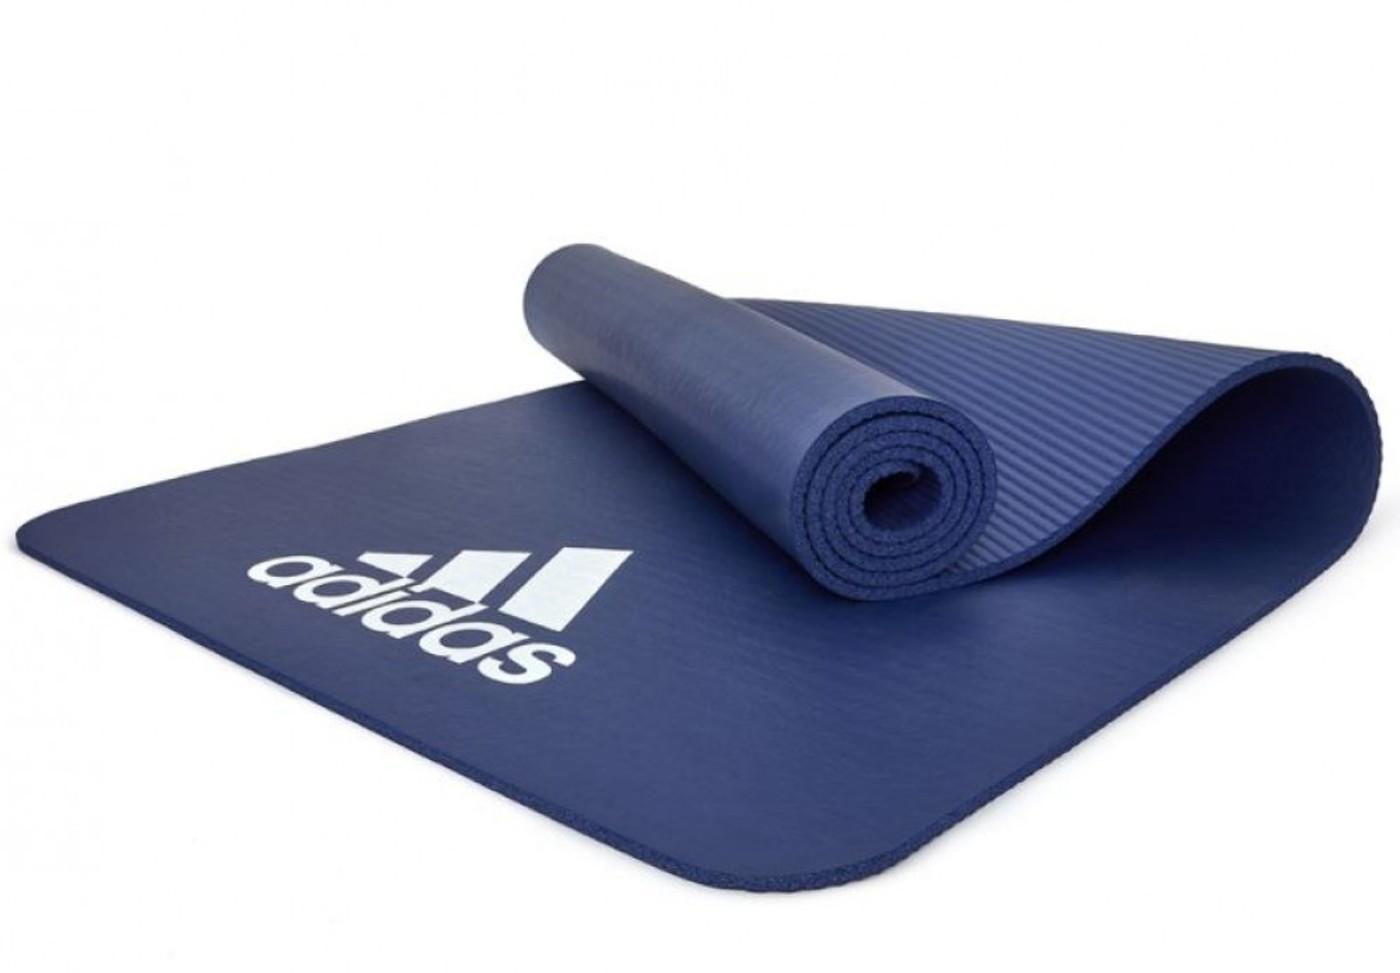 ADIDAS Fitness Mat - 7mm -